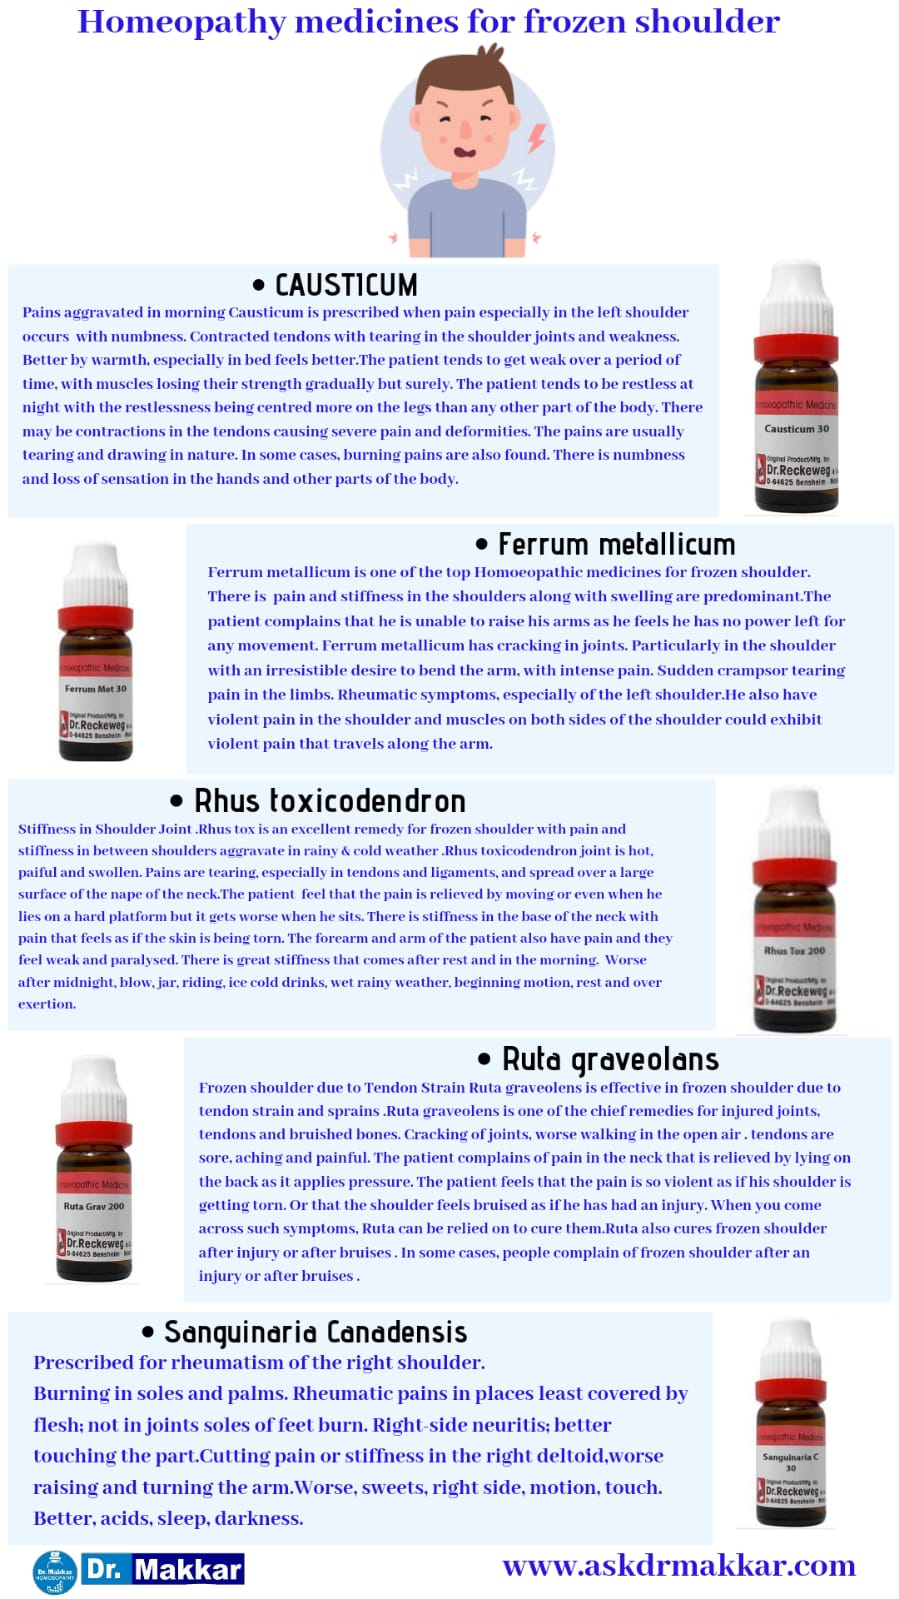 Best Homeopathic Medicines for top Remedies for Frozen Shoulder stiffness of shoulder    कंधे की अकड़न फ्रोज़न शोल्डर की होम्योपैथिक ट्रीटमेंट दवा सर्वश्रेष्ठ होम्योपैथिक दवा शीर्ष उपाय